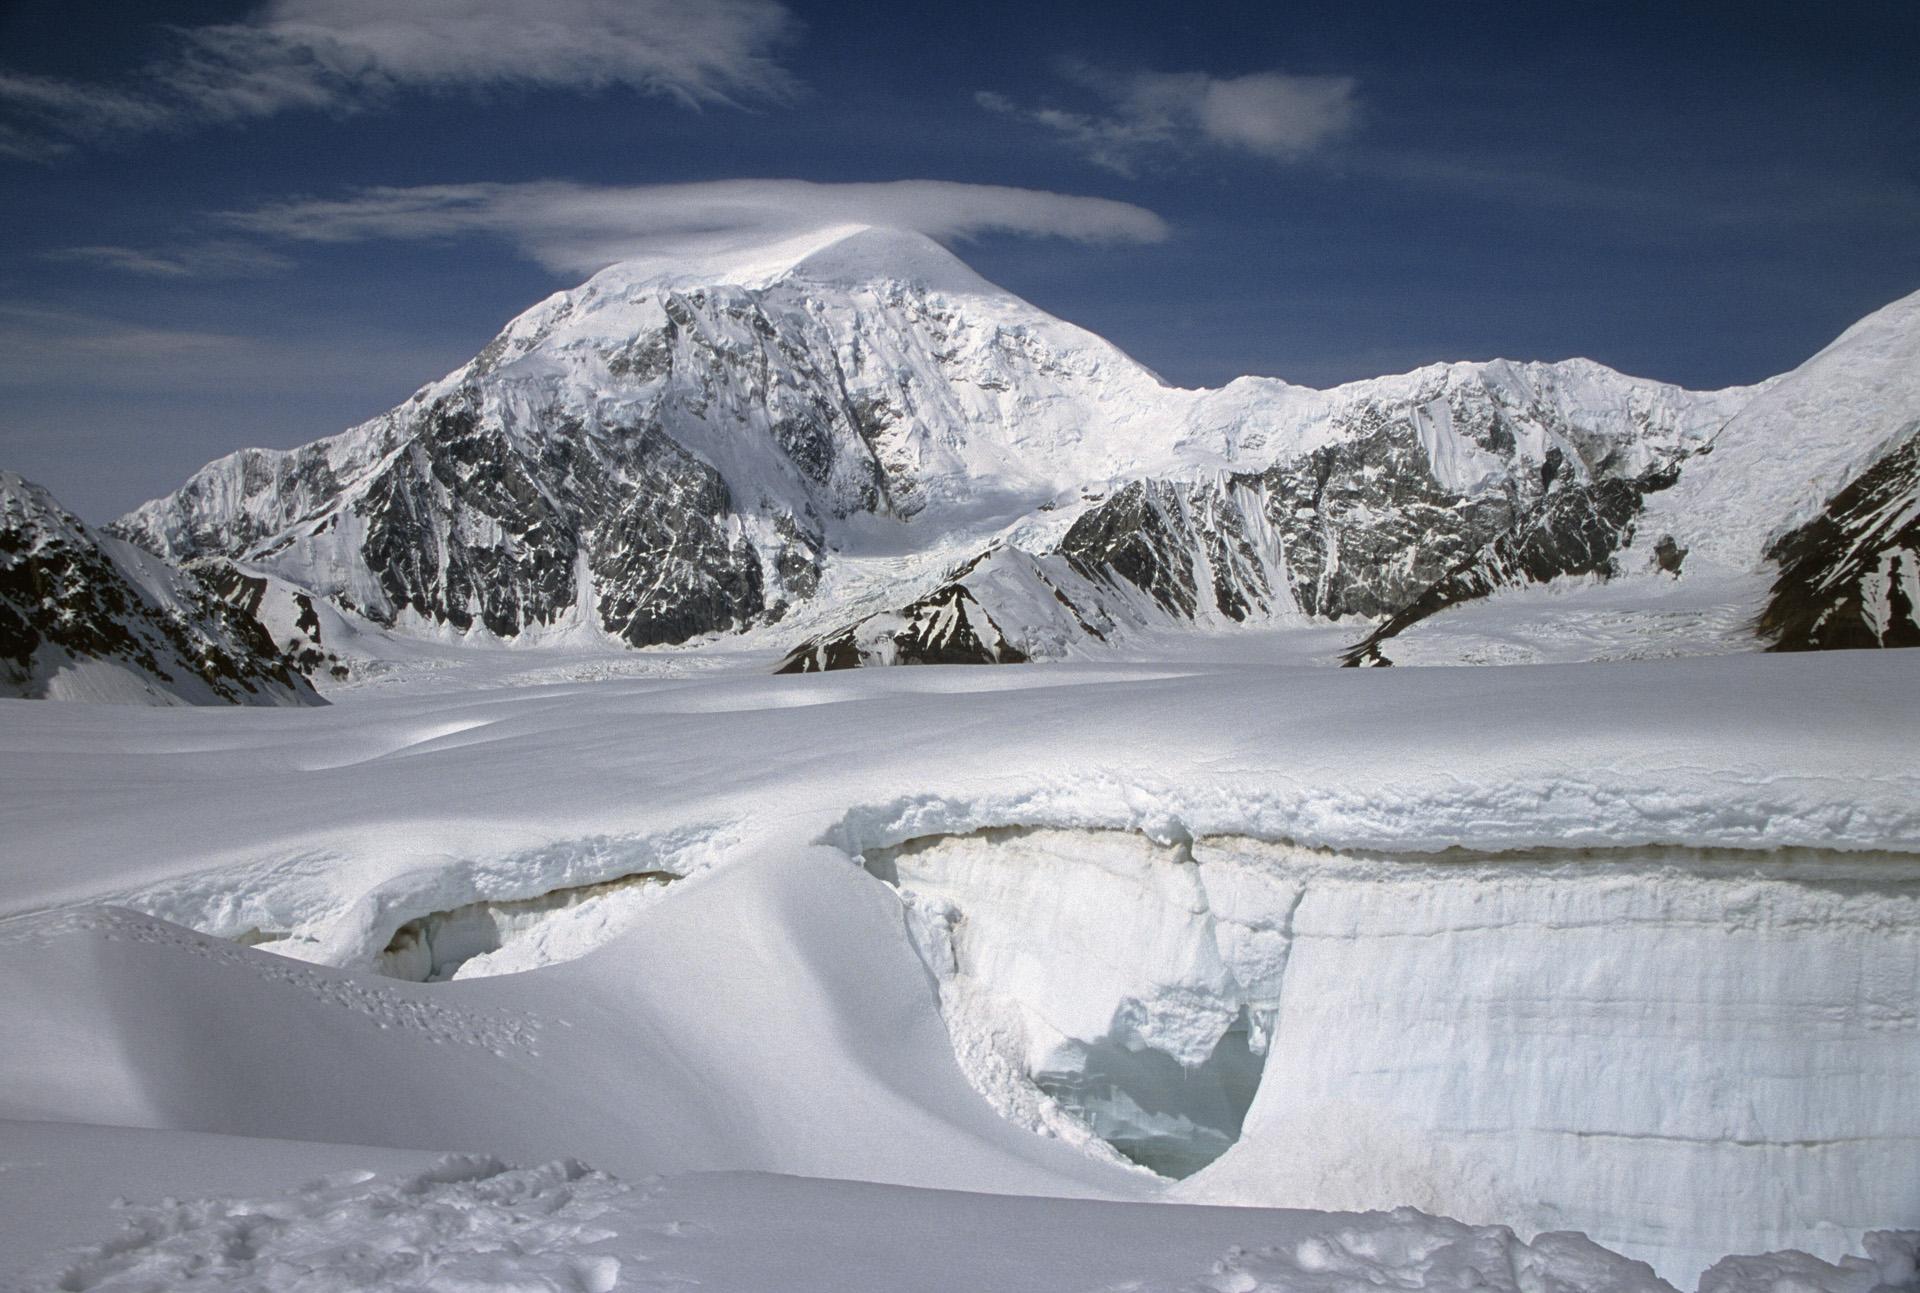 Mt. Foraker 17,400 ft